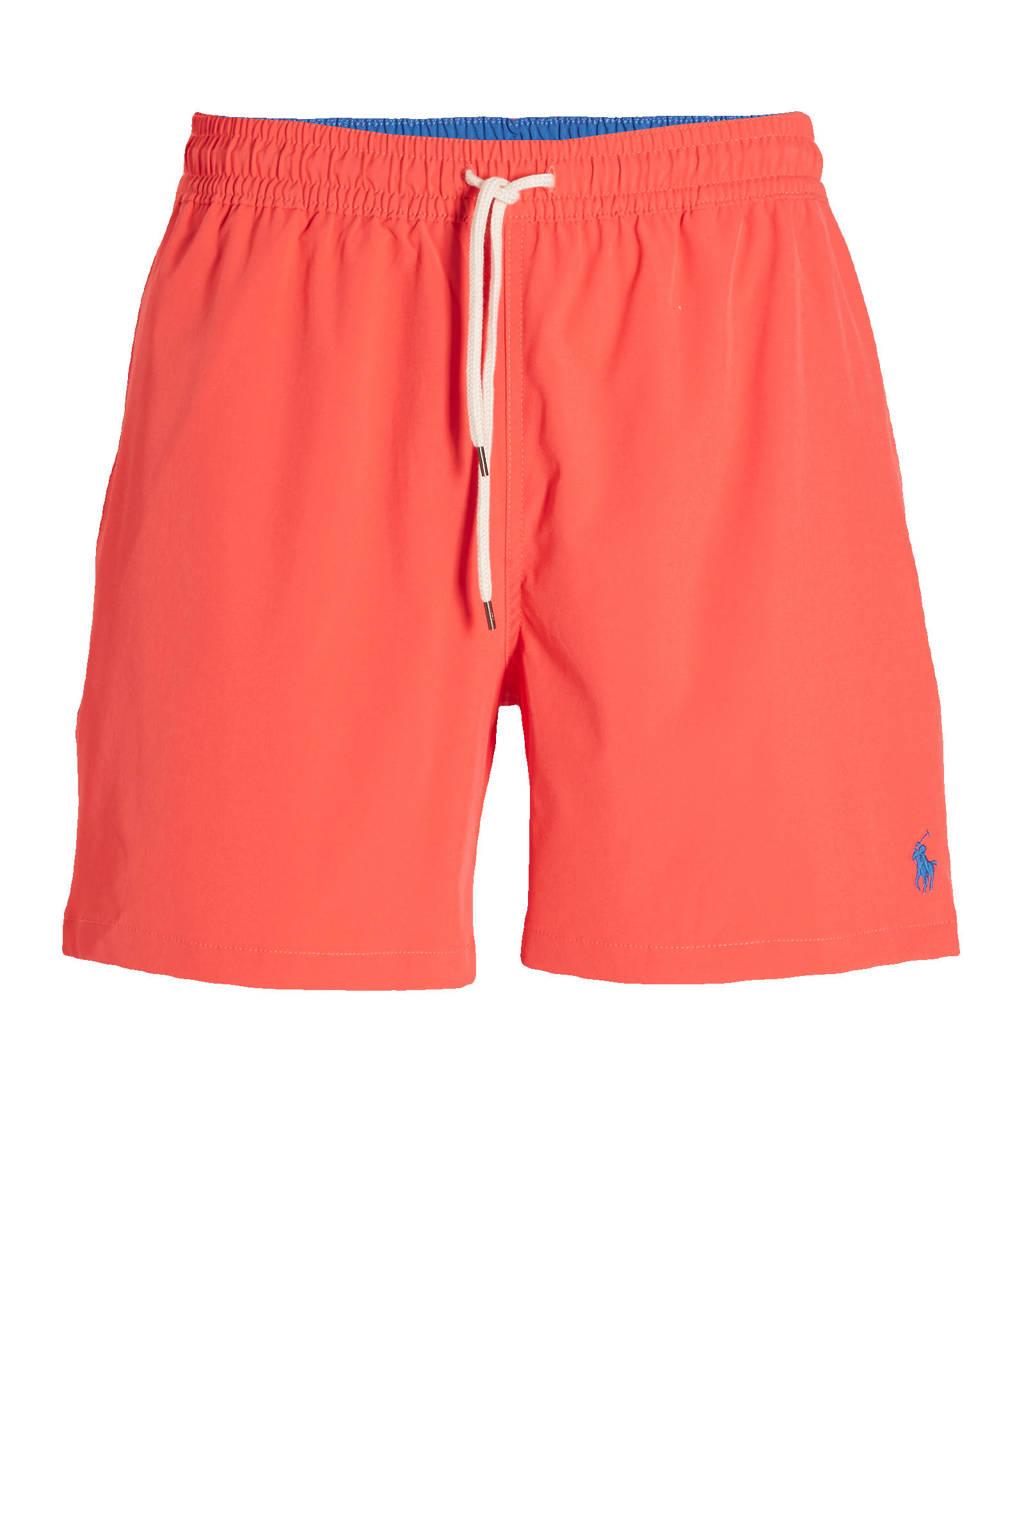 POLO Ralph Lauren zwemshort met geborduurd logo koraalrood, Koraalrood